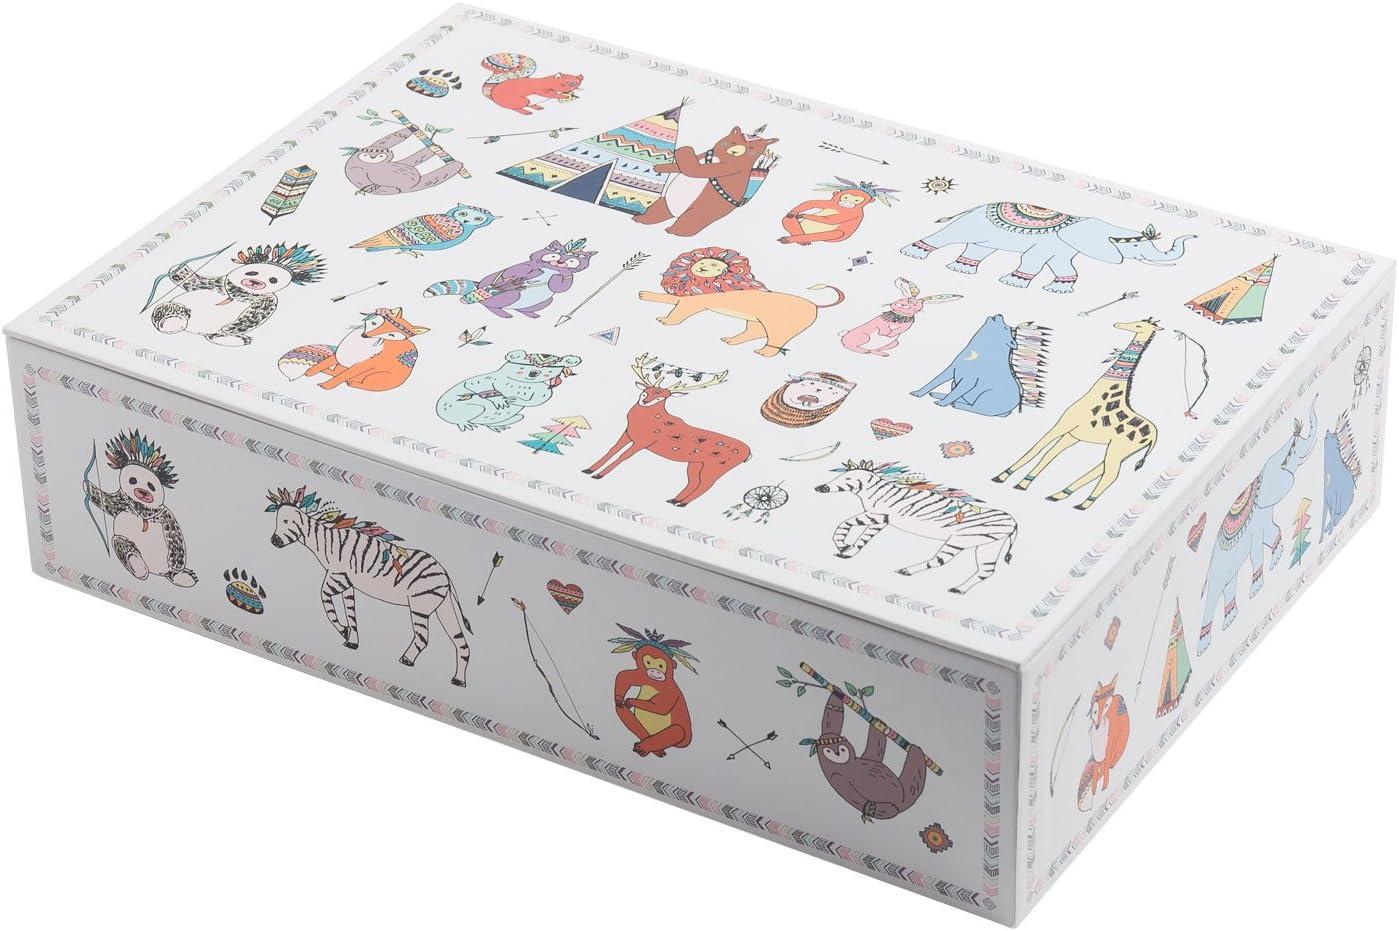 Creibo CBOX007 - Caja Cartón Grande Decorada Animales: Amazon.es: Hogar